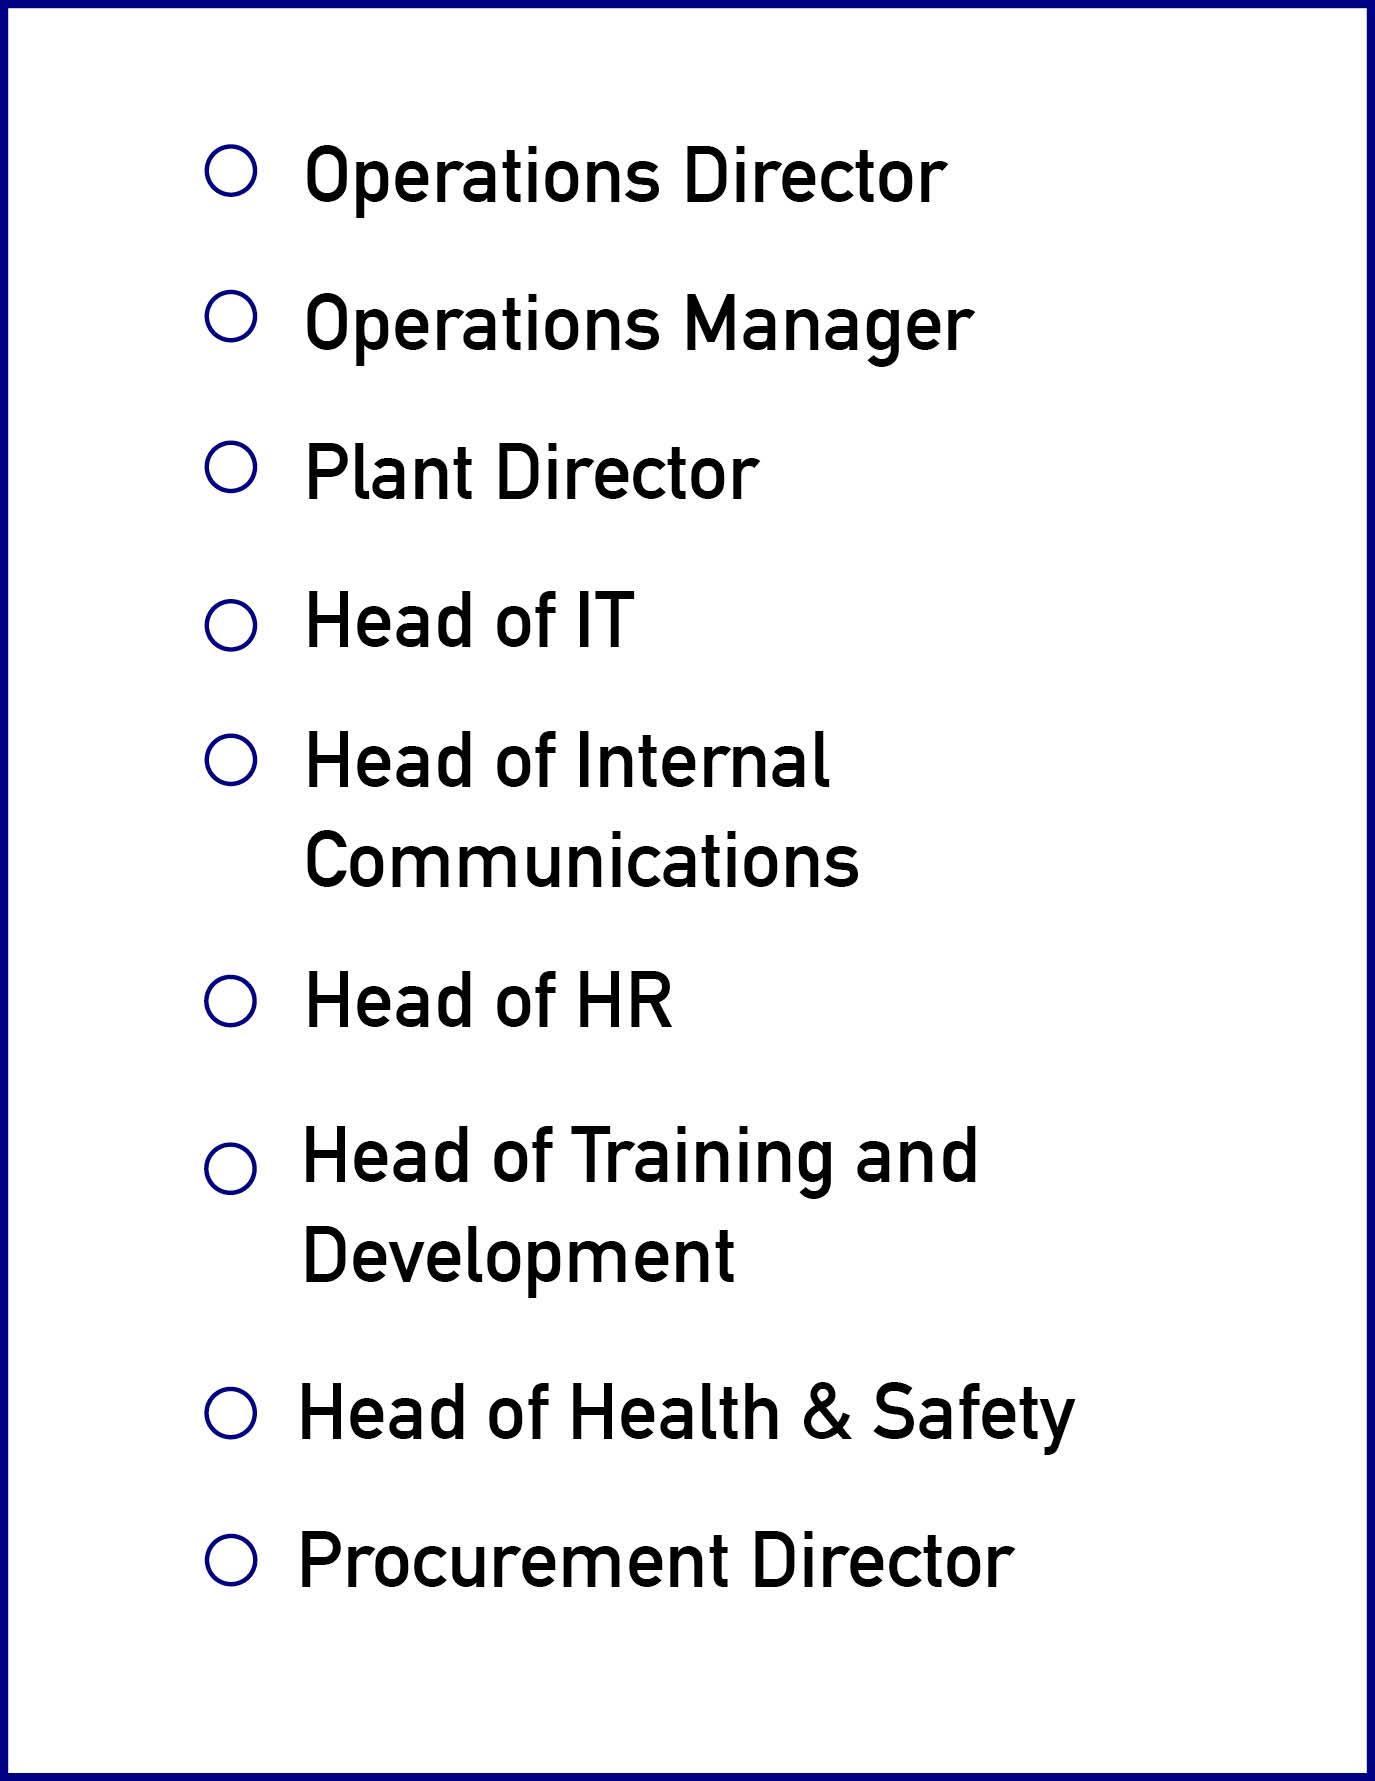 job-titles22.jpg